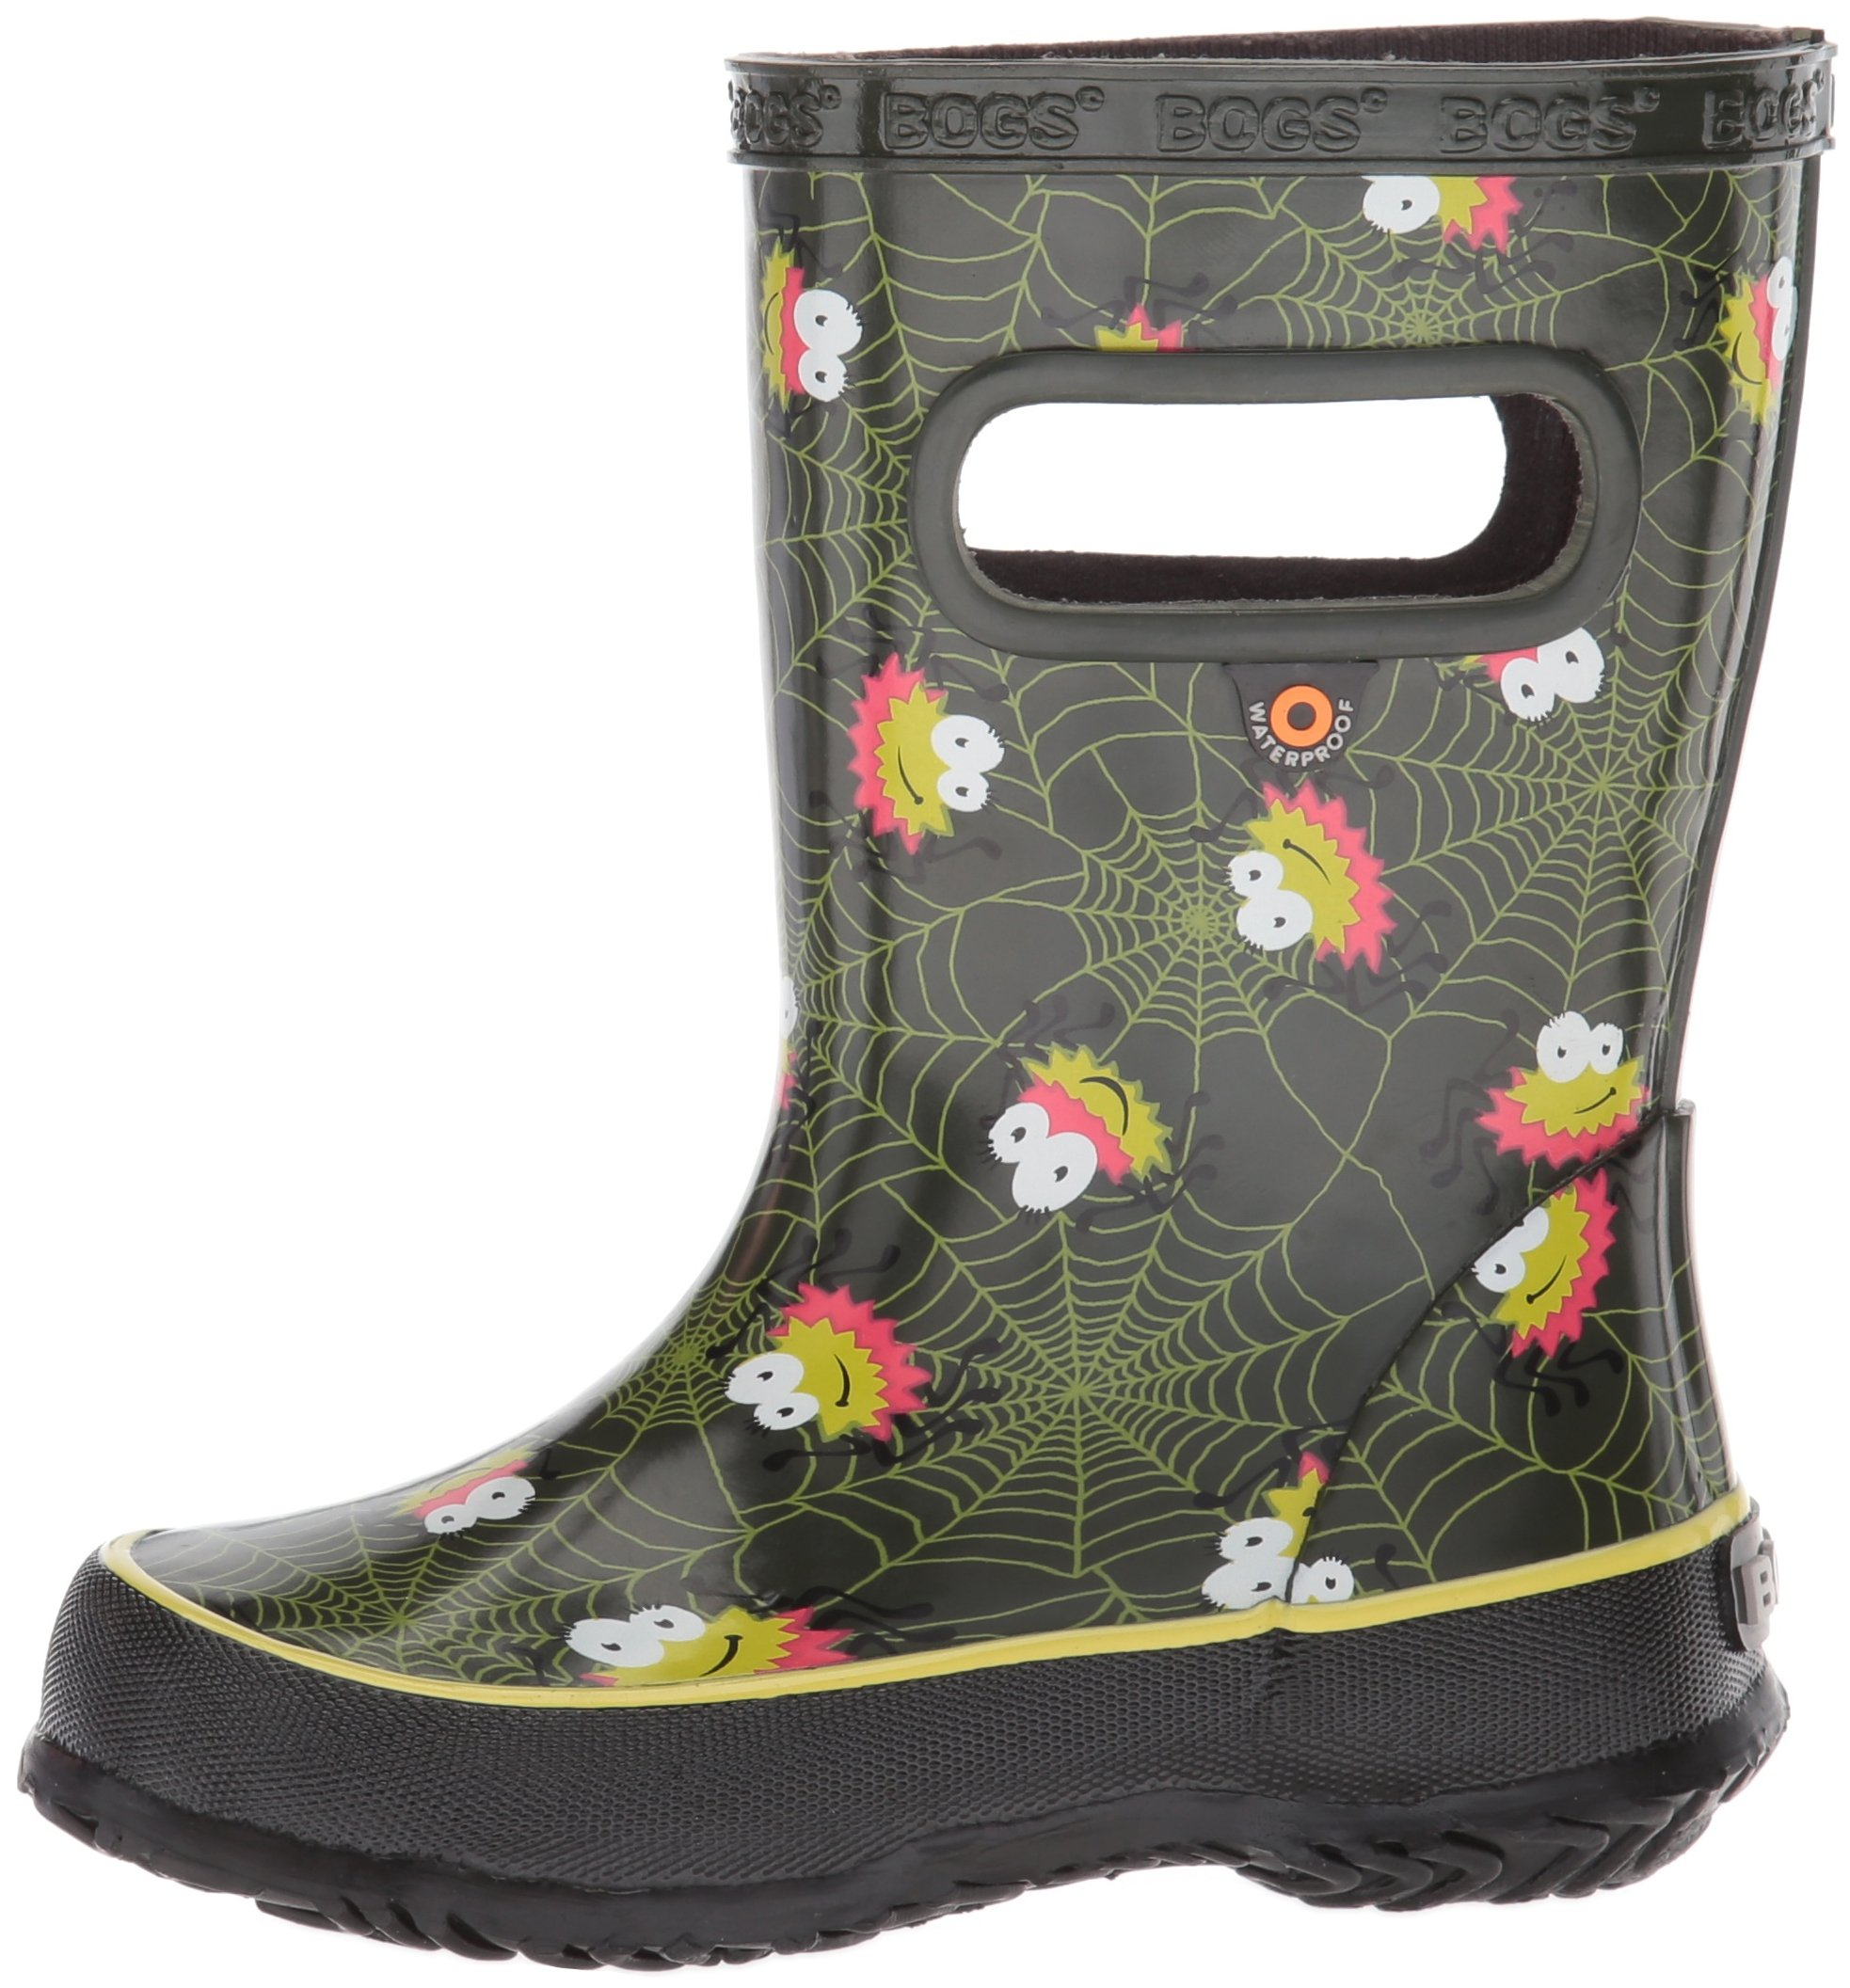 Bogs Kids' Skipper Waterproof Rubber Rain Boot for Boys and Girls,Smiley Spiders/Dark Green/Multi,11 M US Little Kid by Bogs (Image #5)